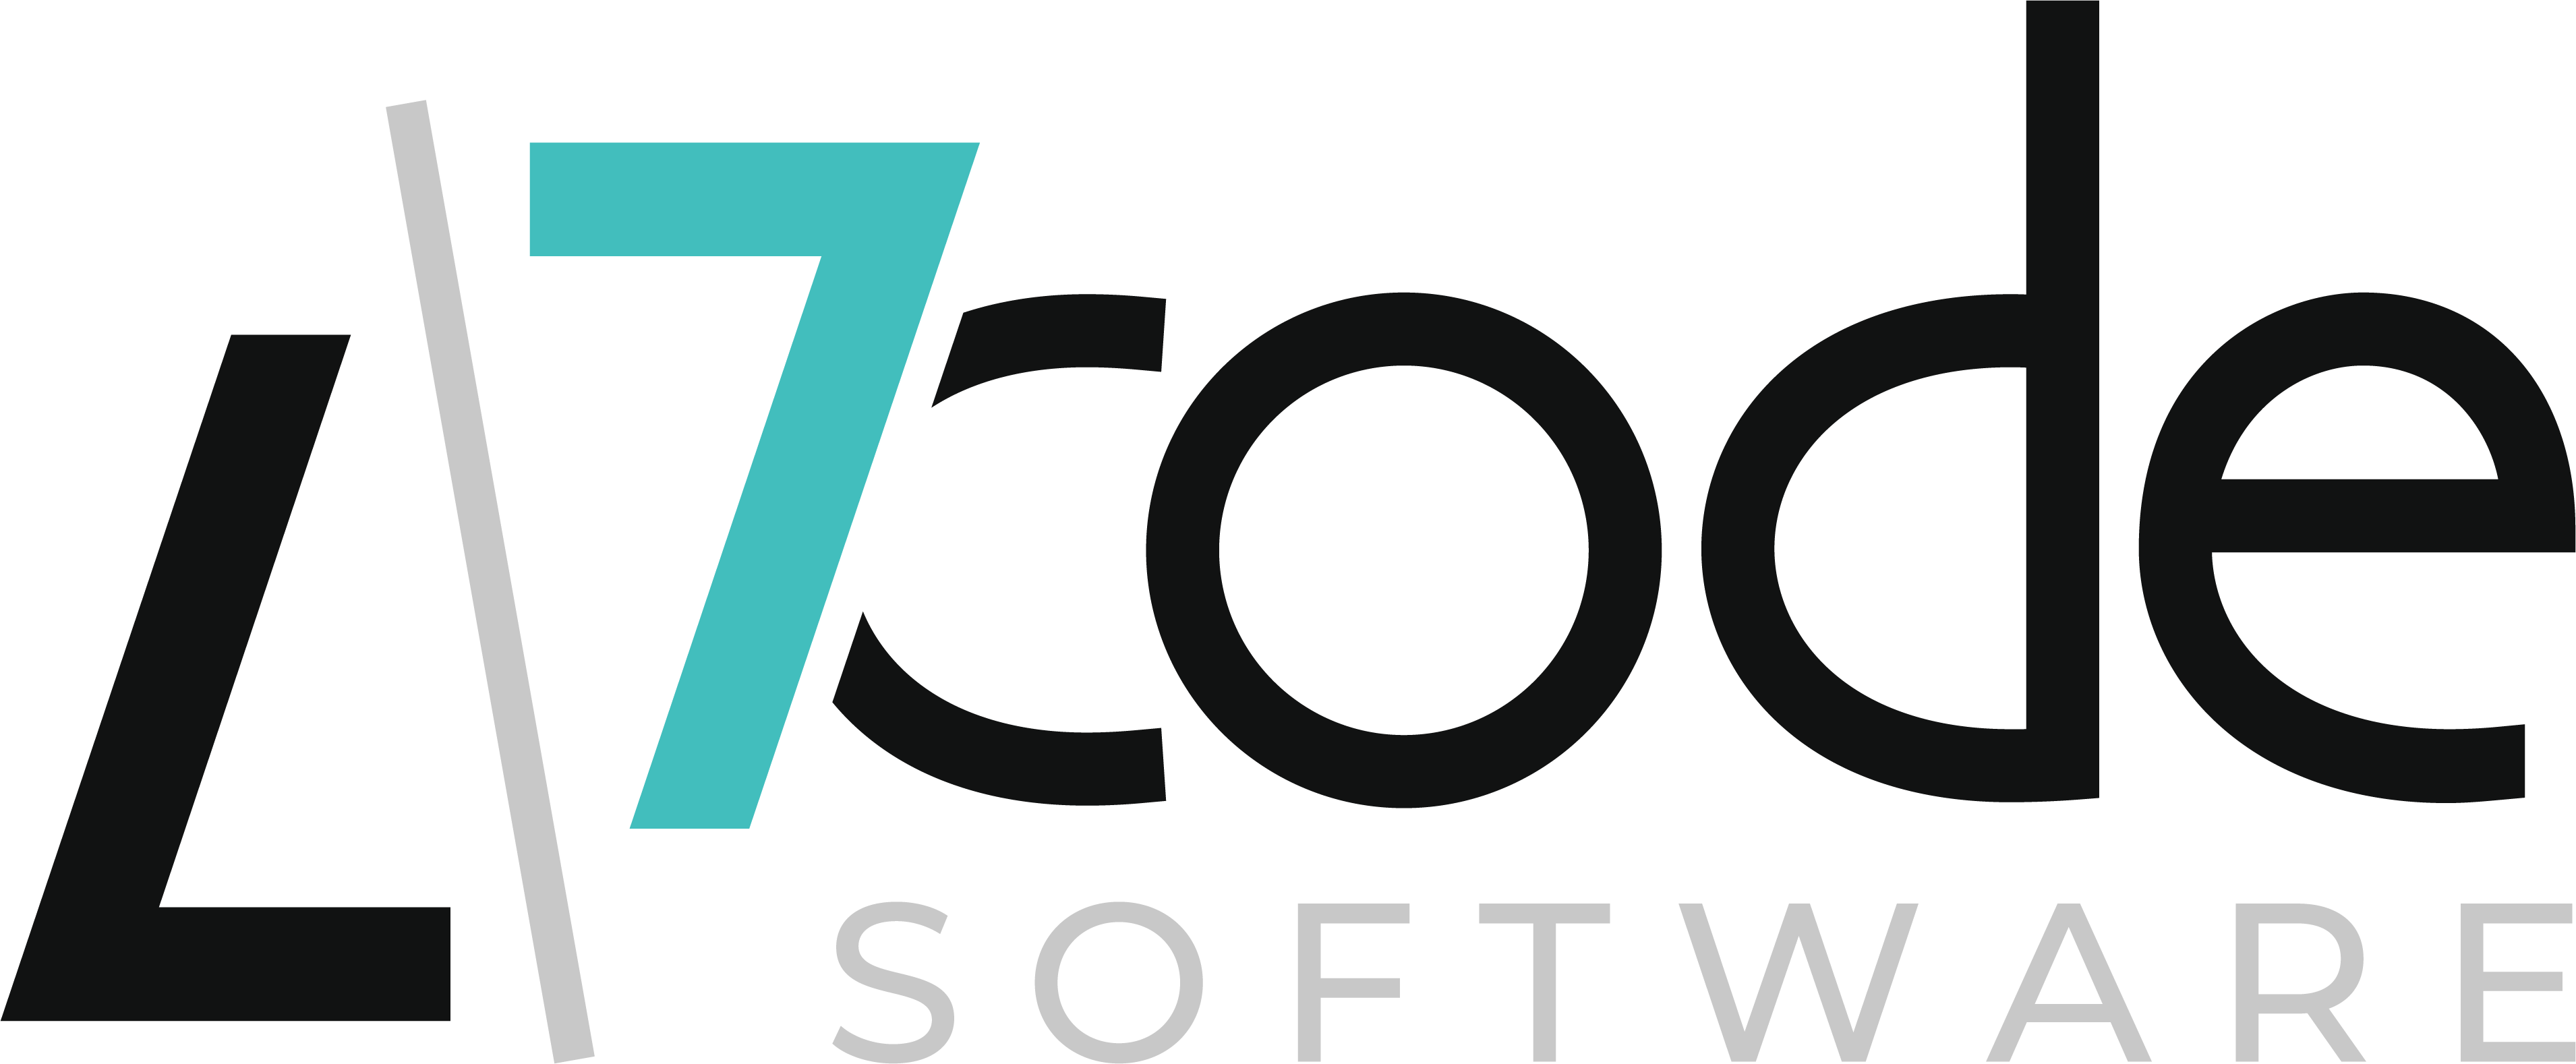 7code Logo